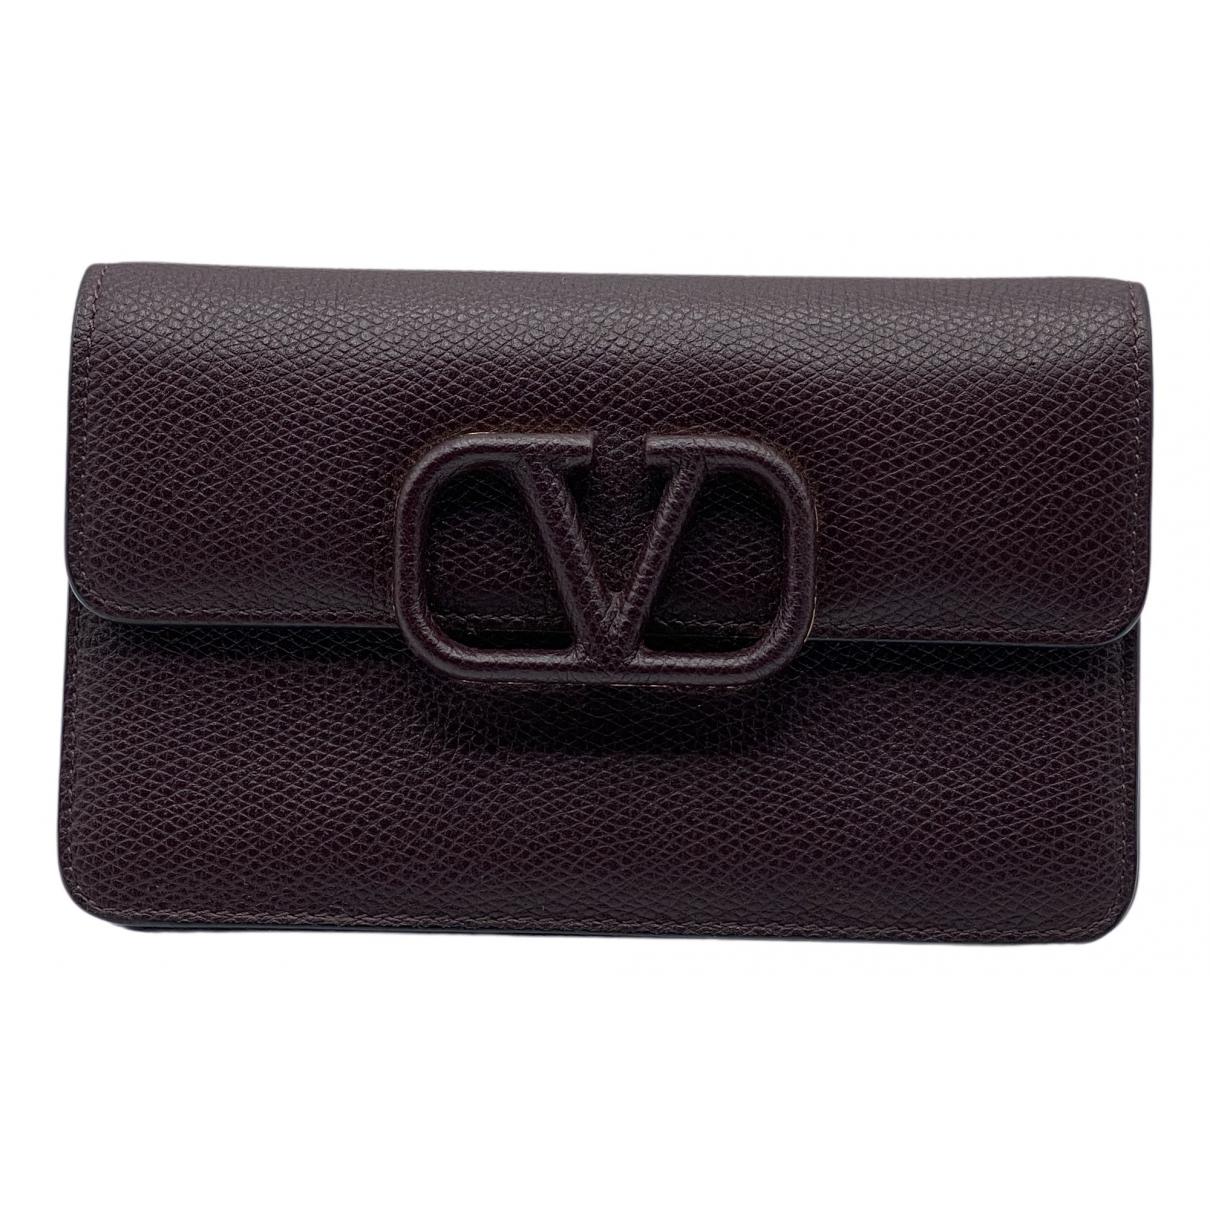 Valentino Garavani \N Burgundy Leather wallet for Women \N